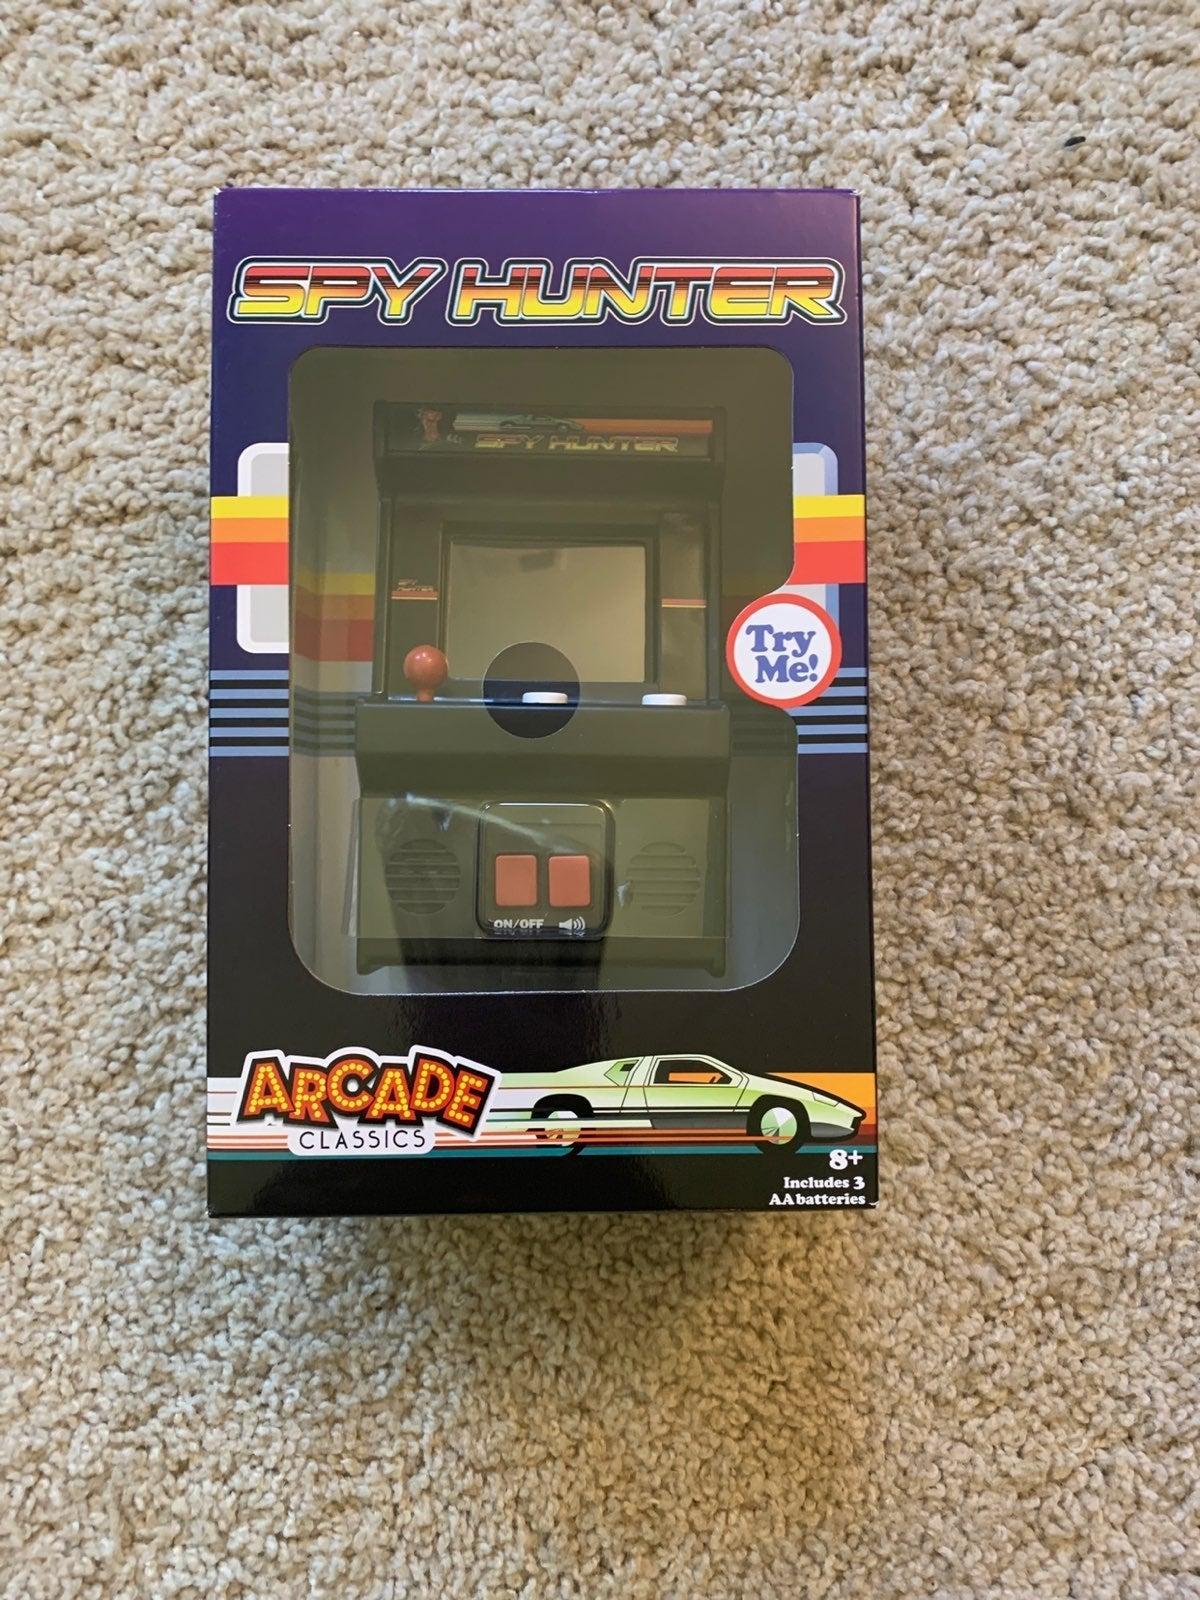 Arcade Classic Spy Hunter NEW